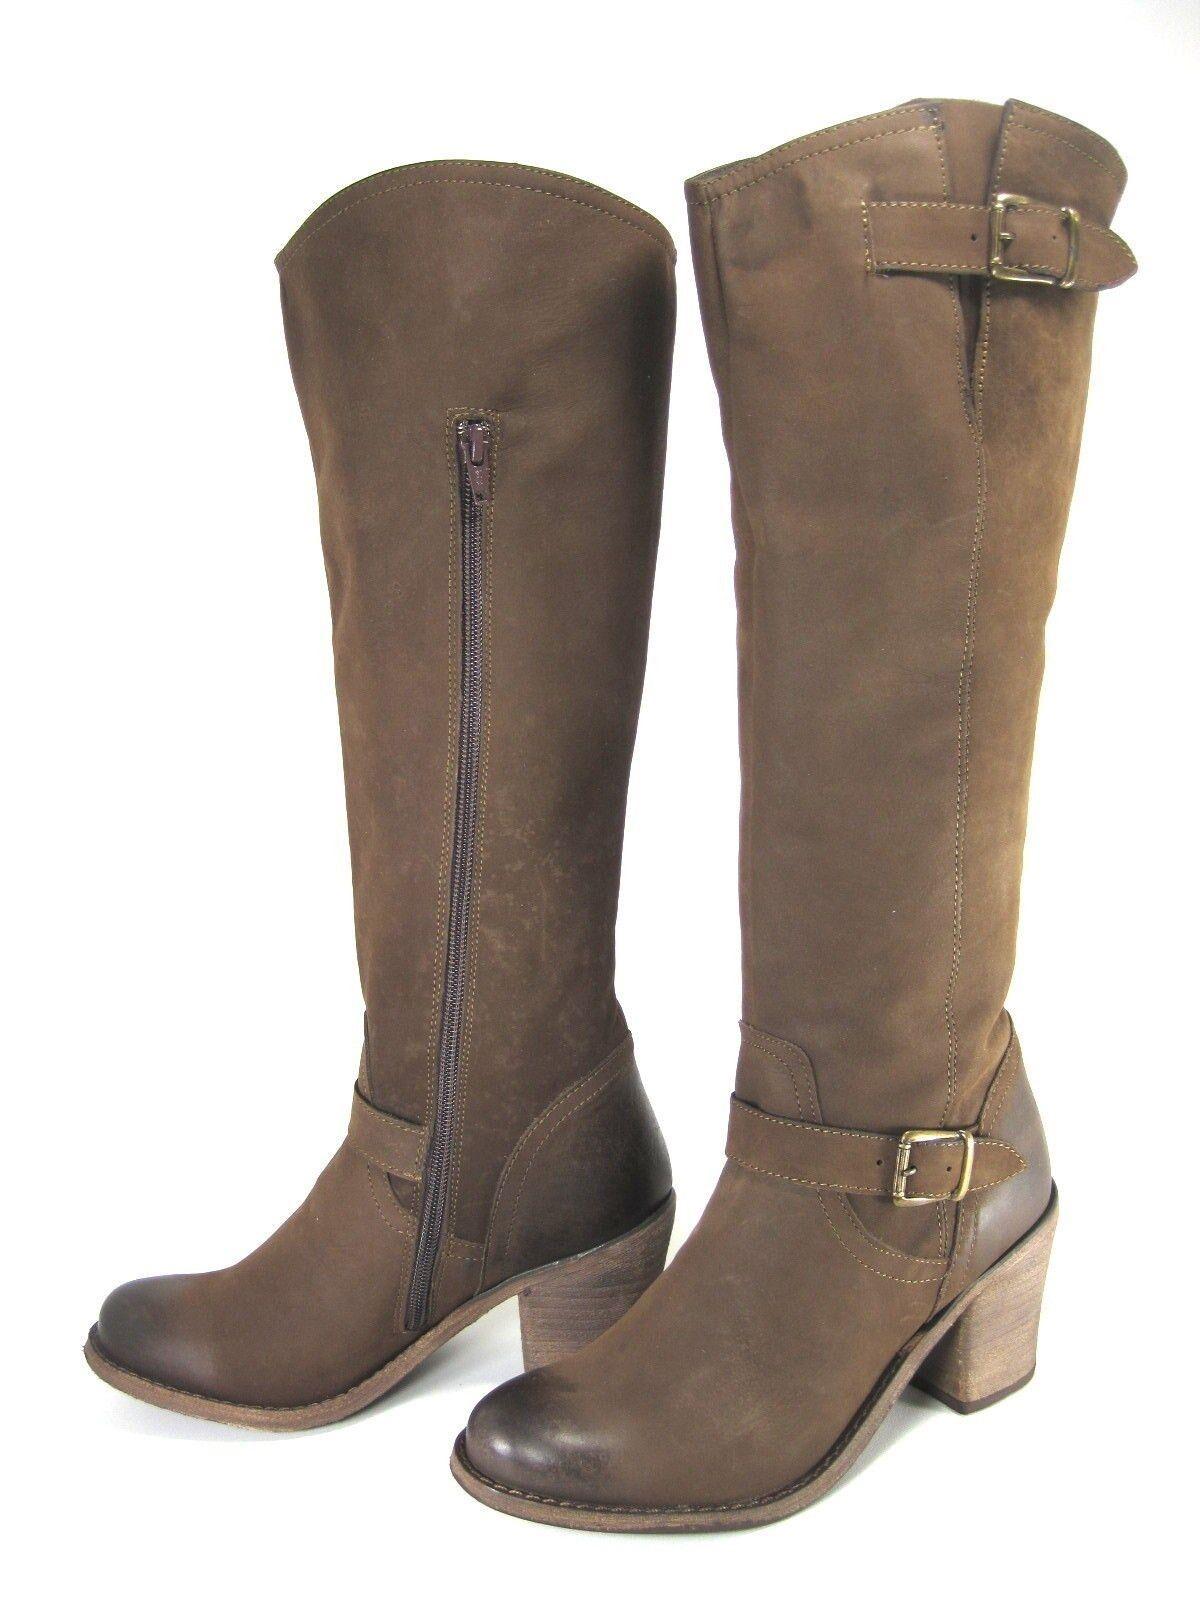 New Steve Madden tall braun harness buckle Stiefel BOLERO 7.5  180+ 3  heel LAST